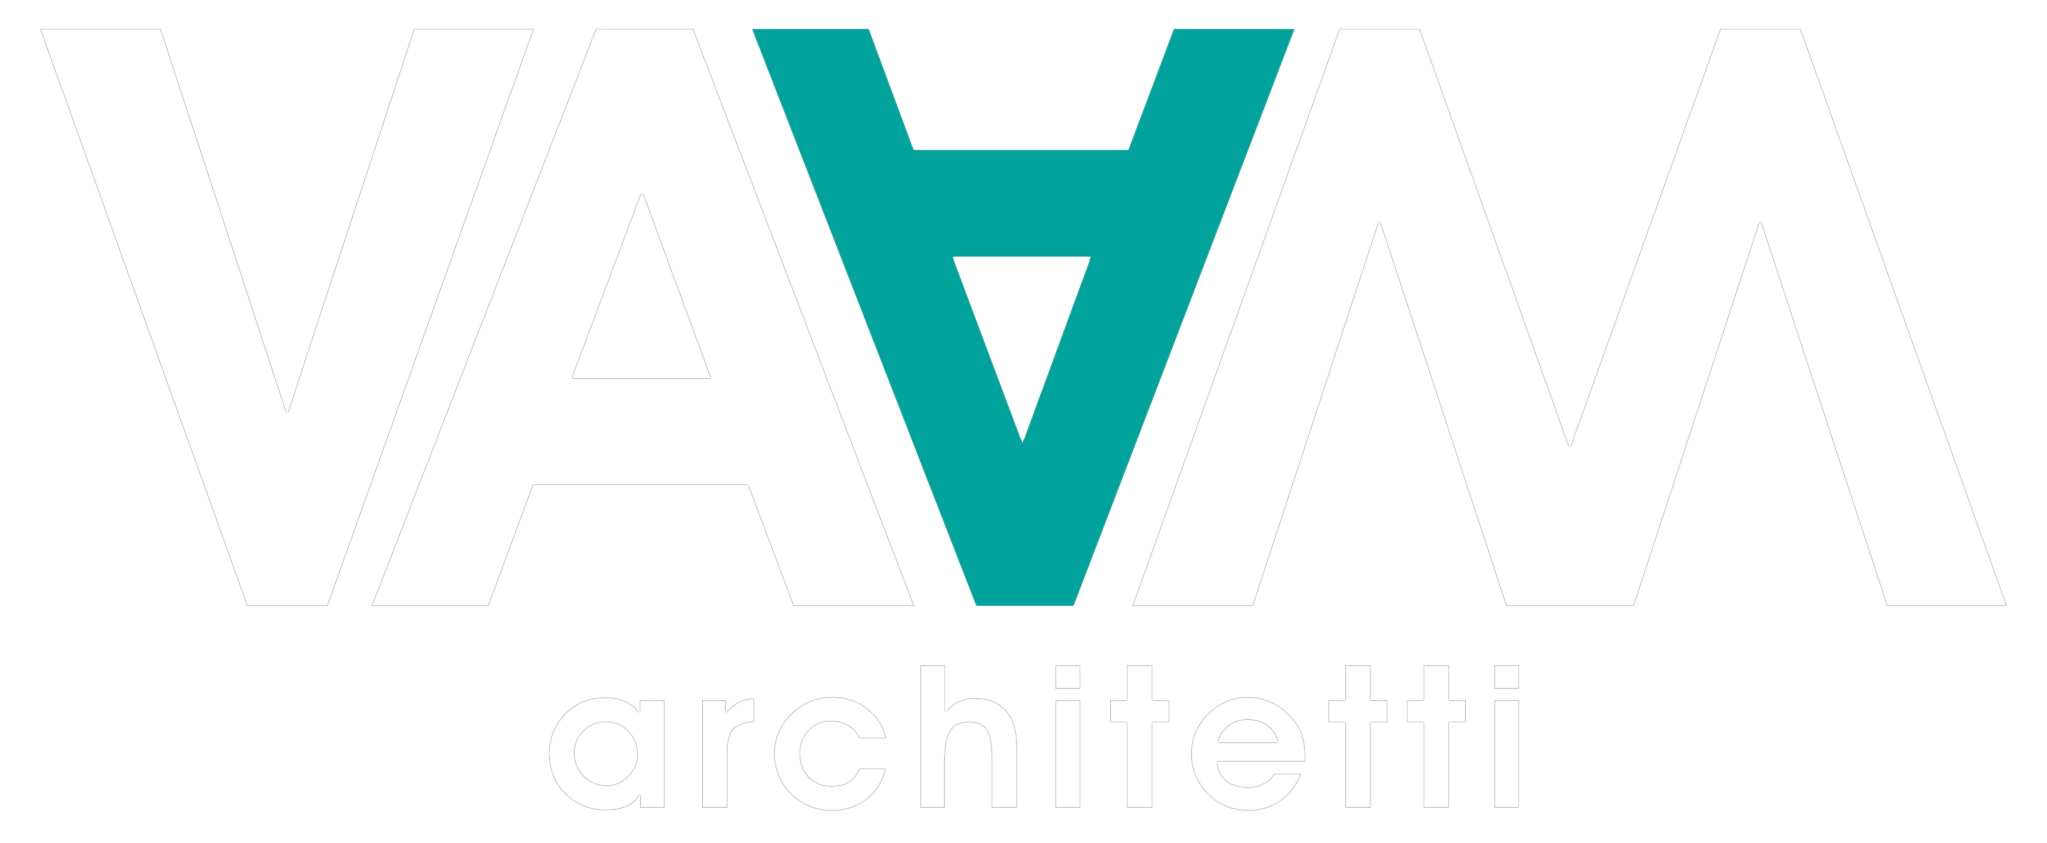 VAAM architetti